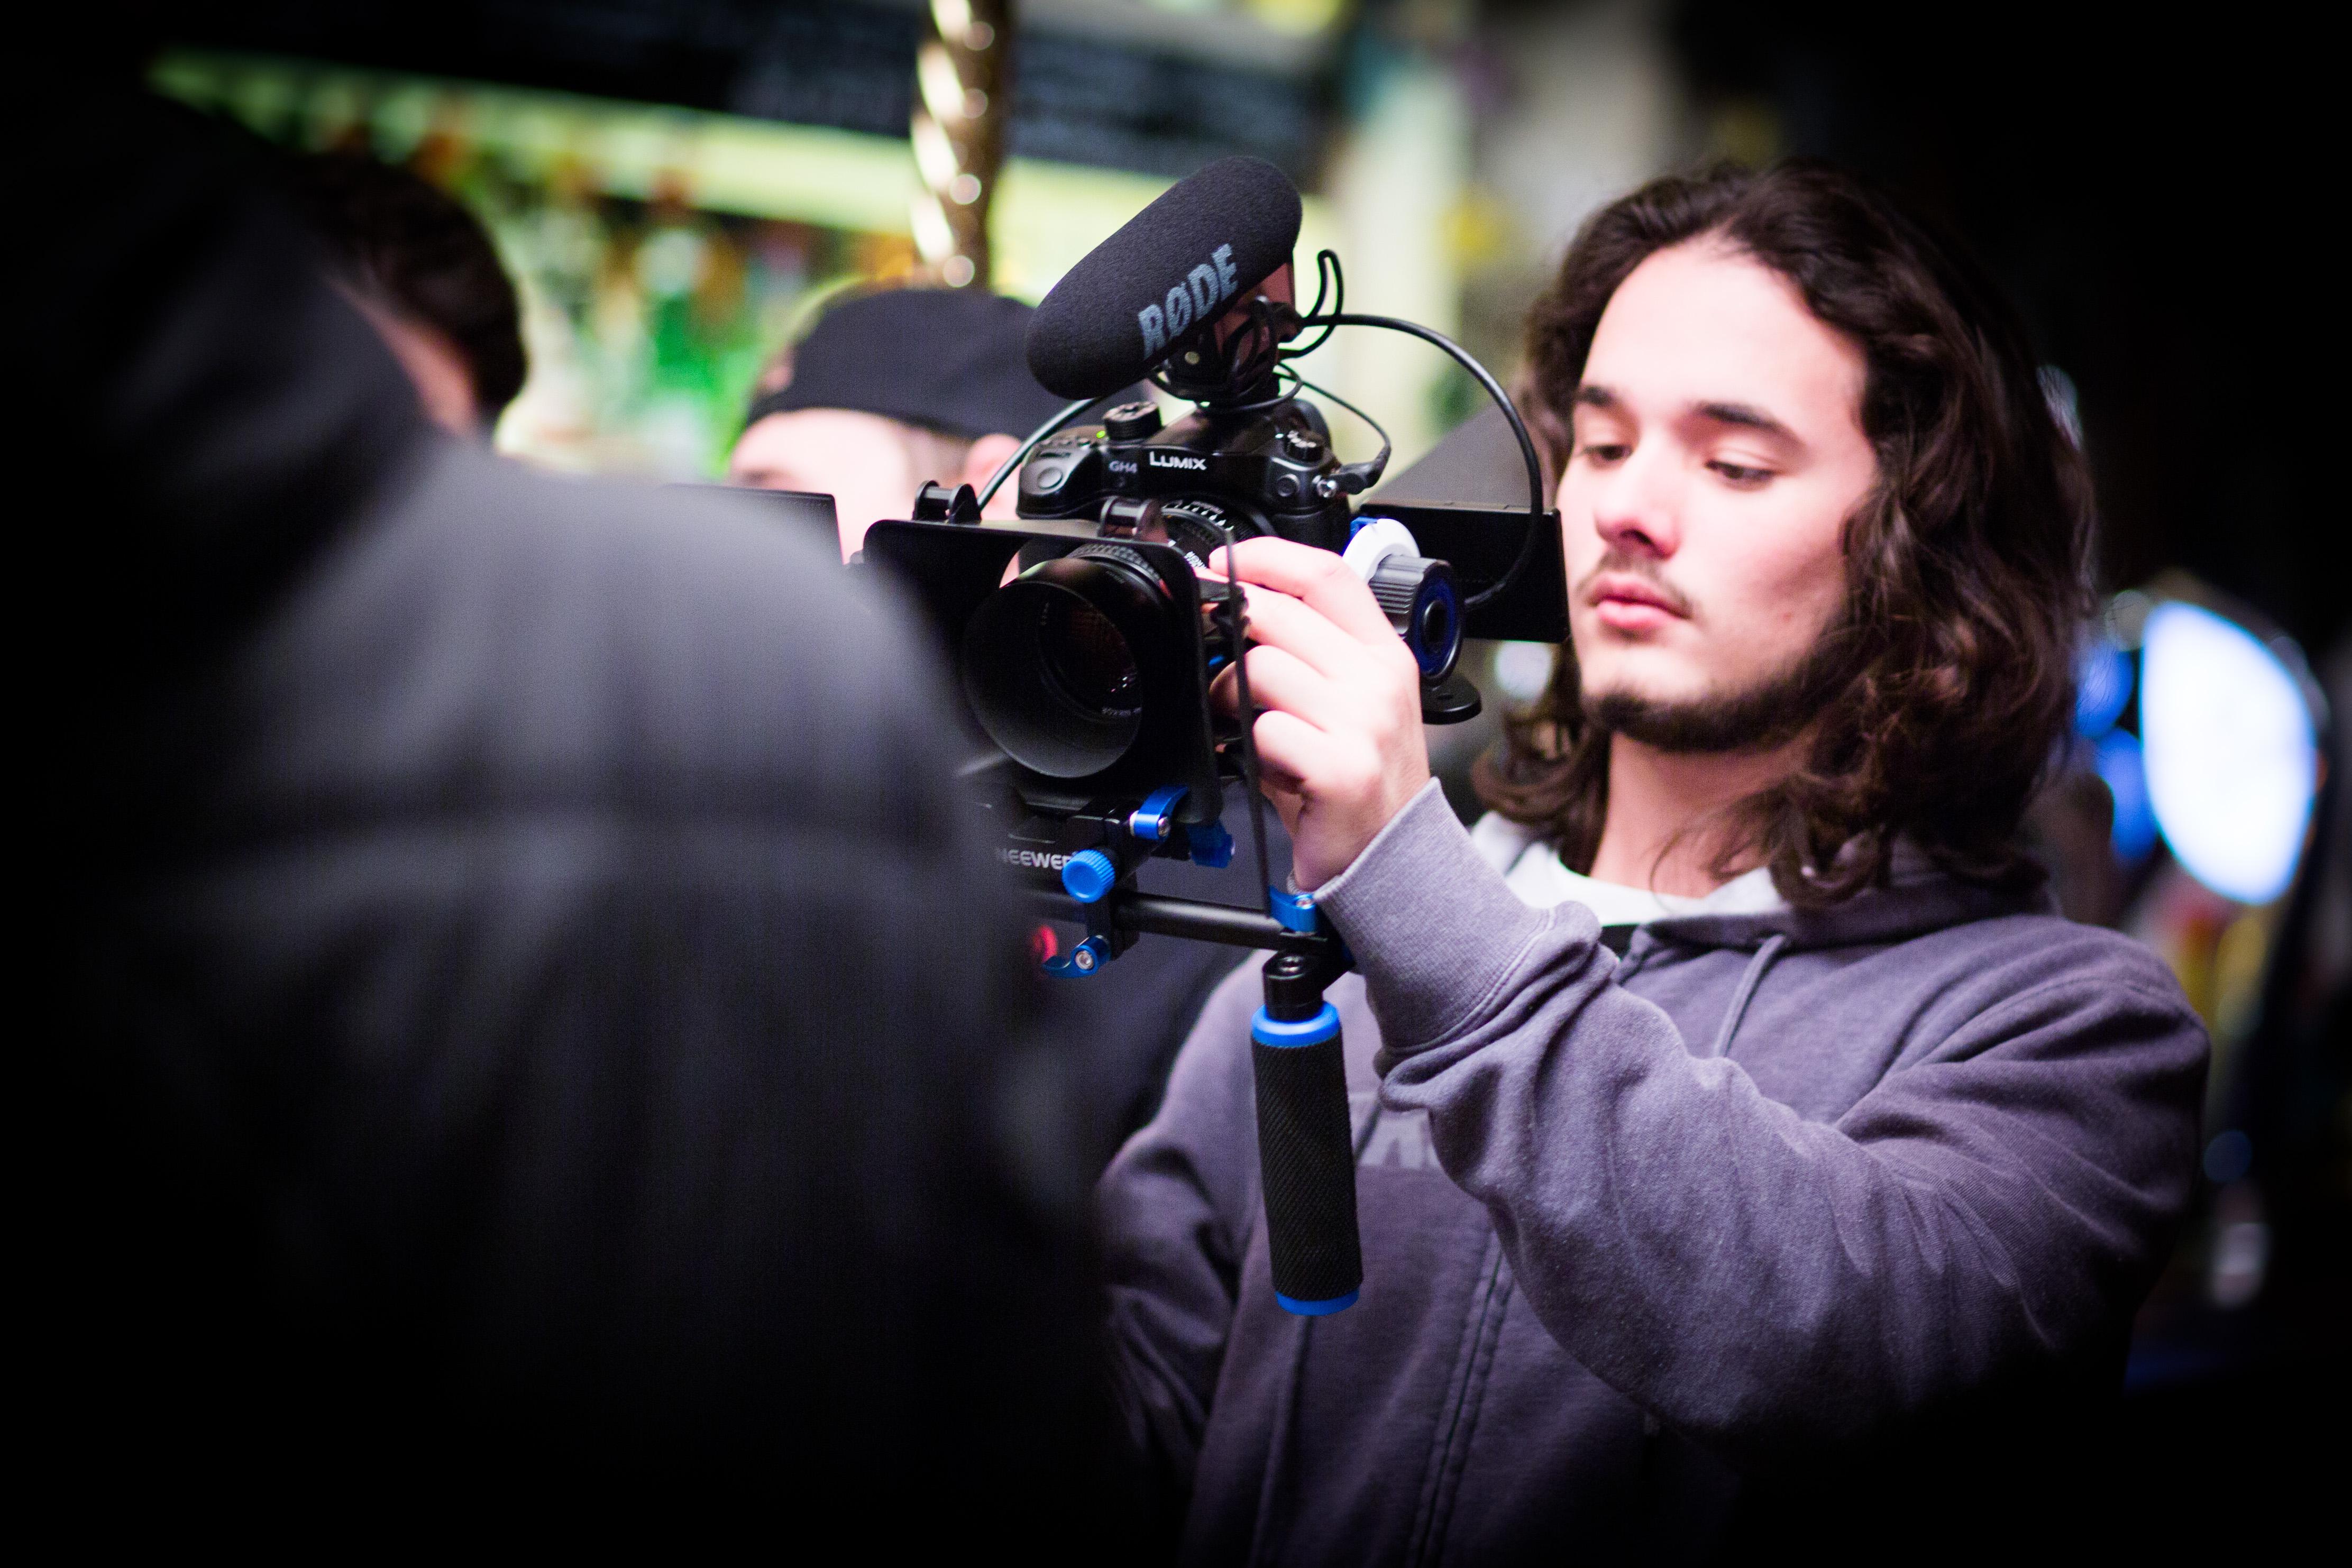 'Watch' (2016)